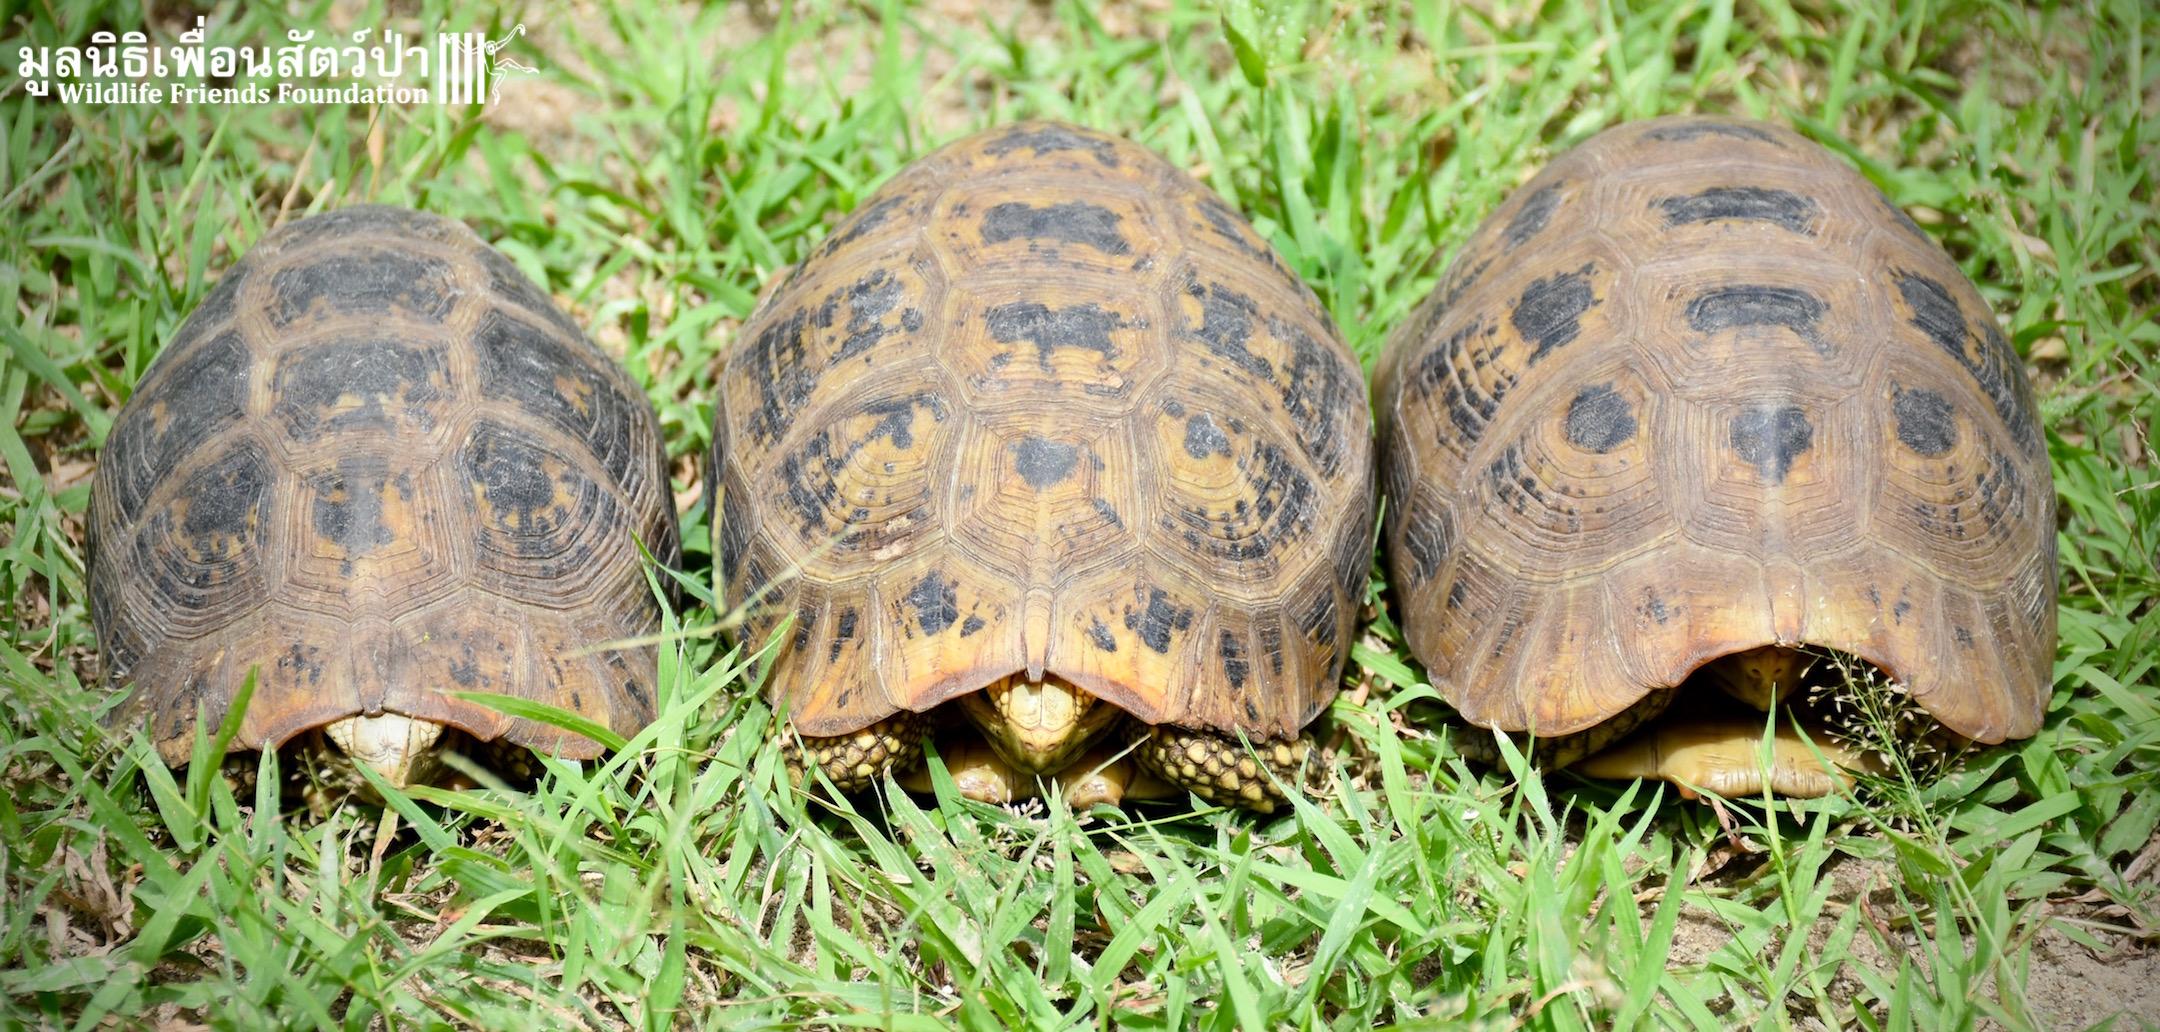 Endangered Elongated Tortoises Rescued